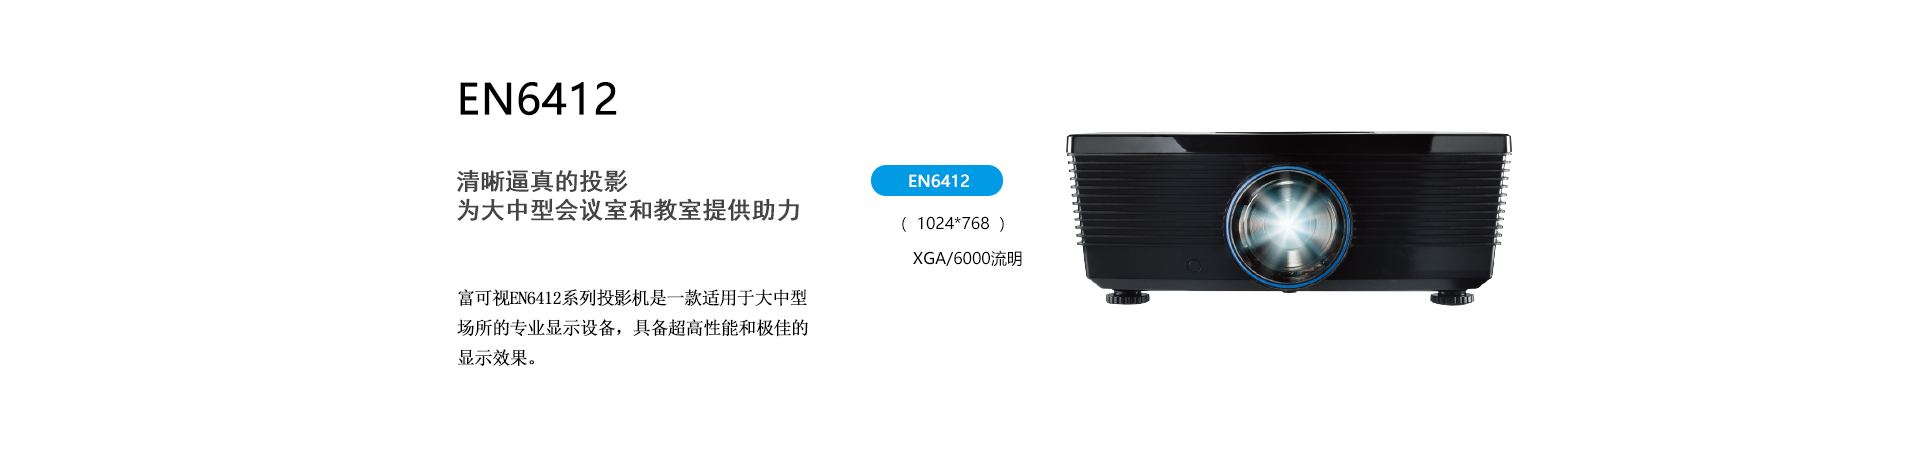 EN6412